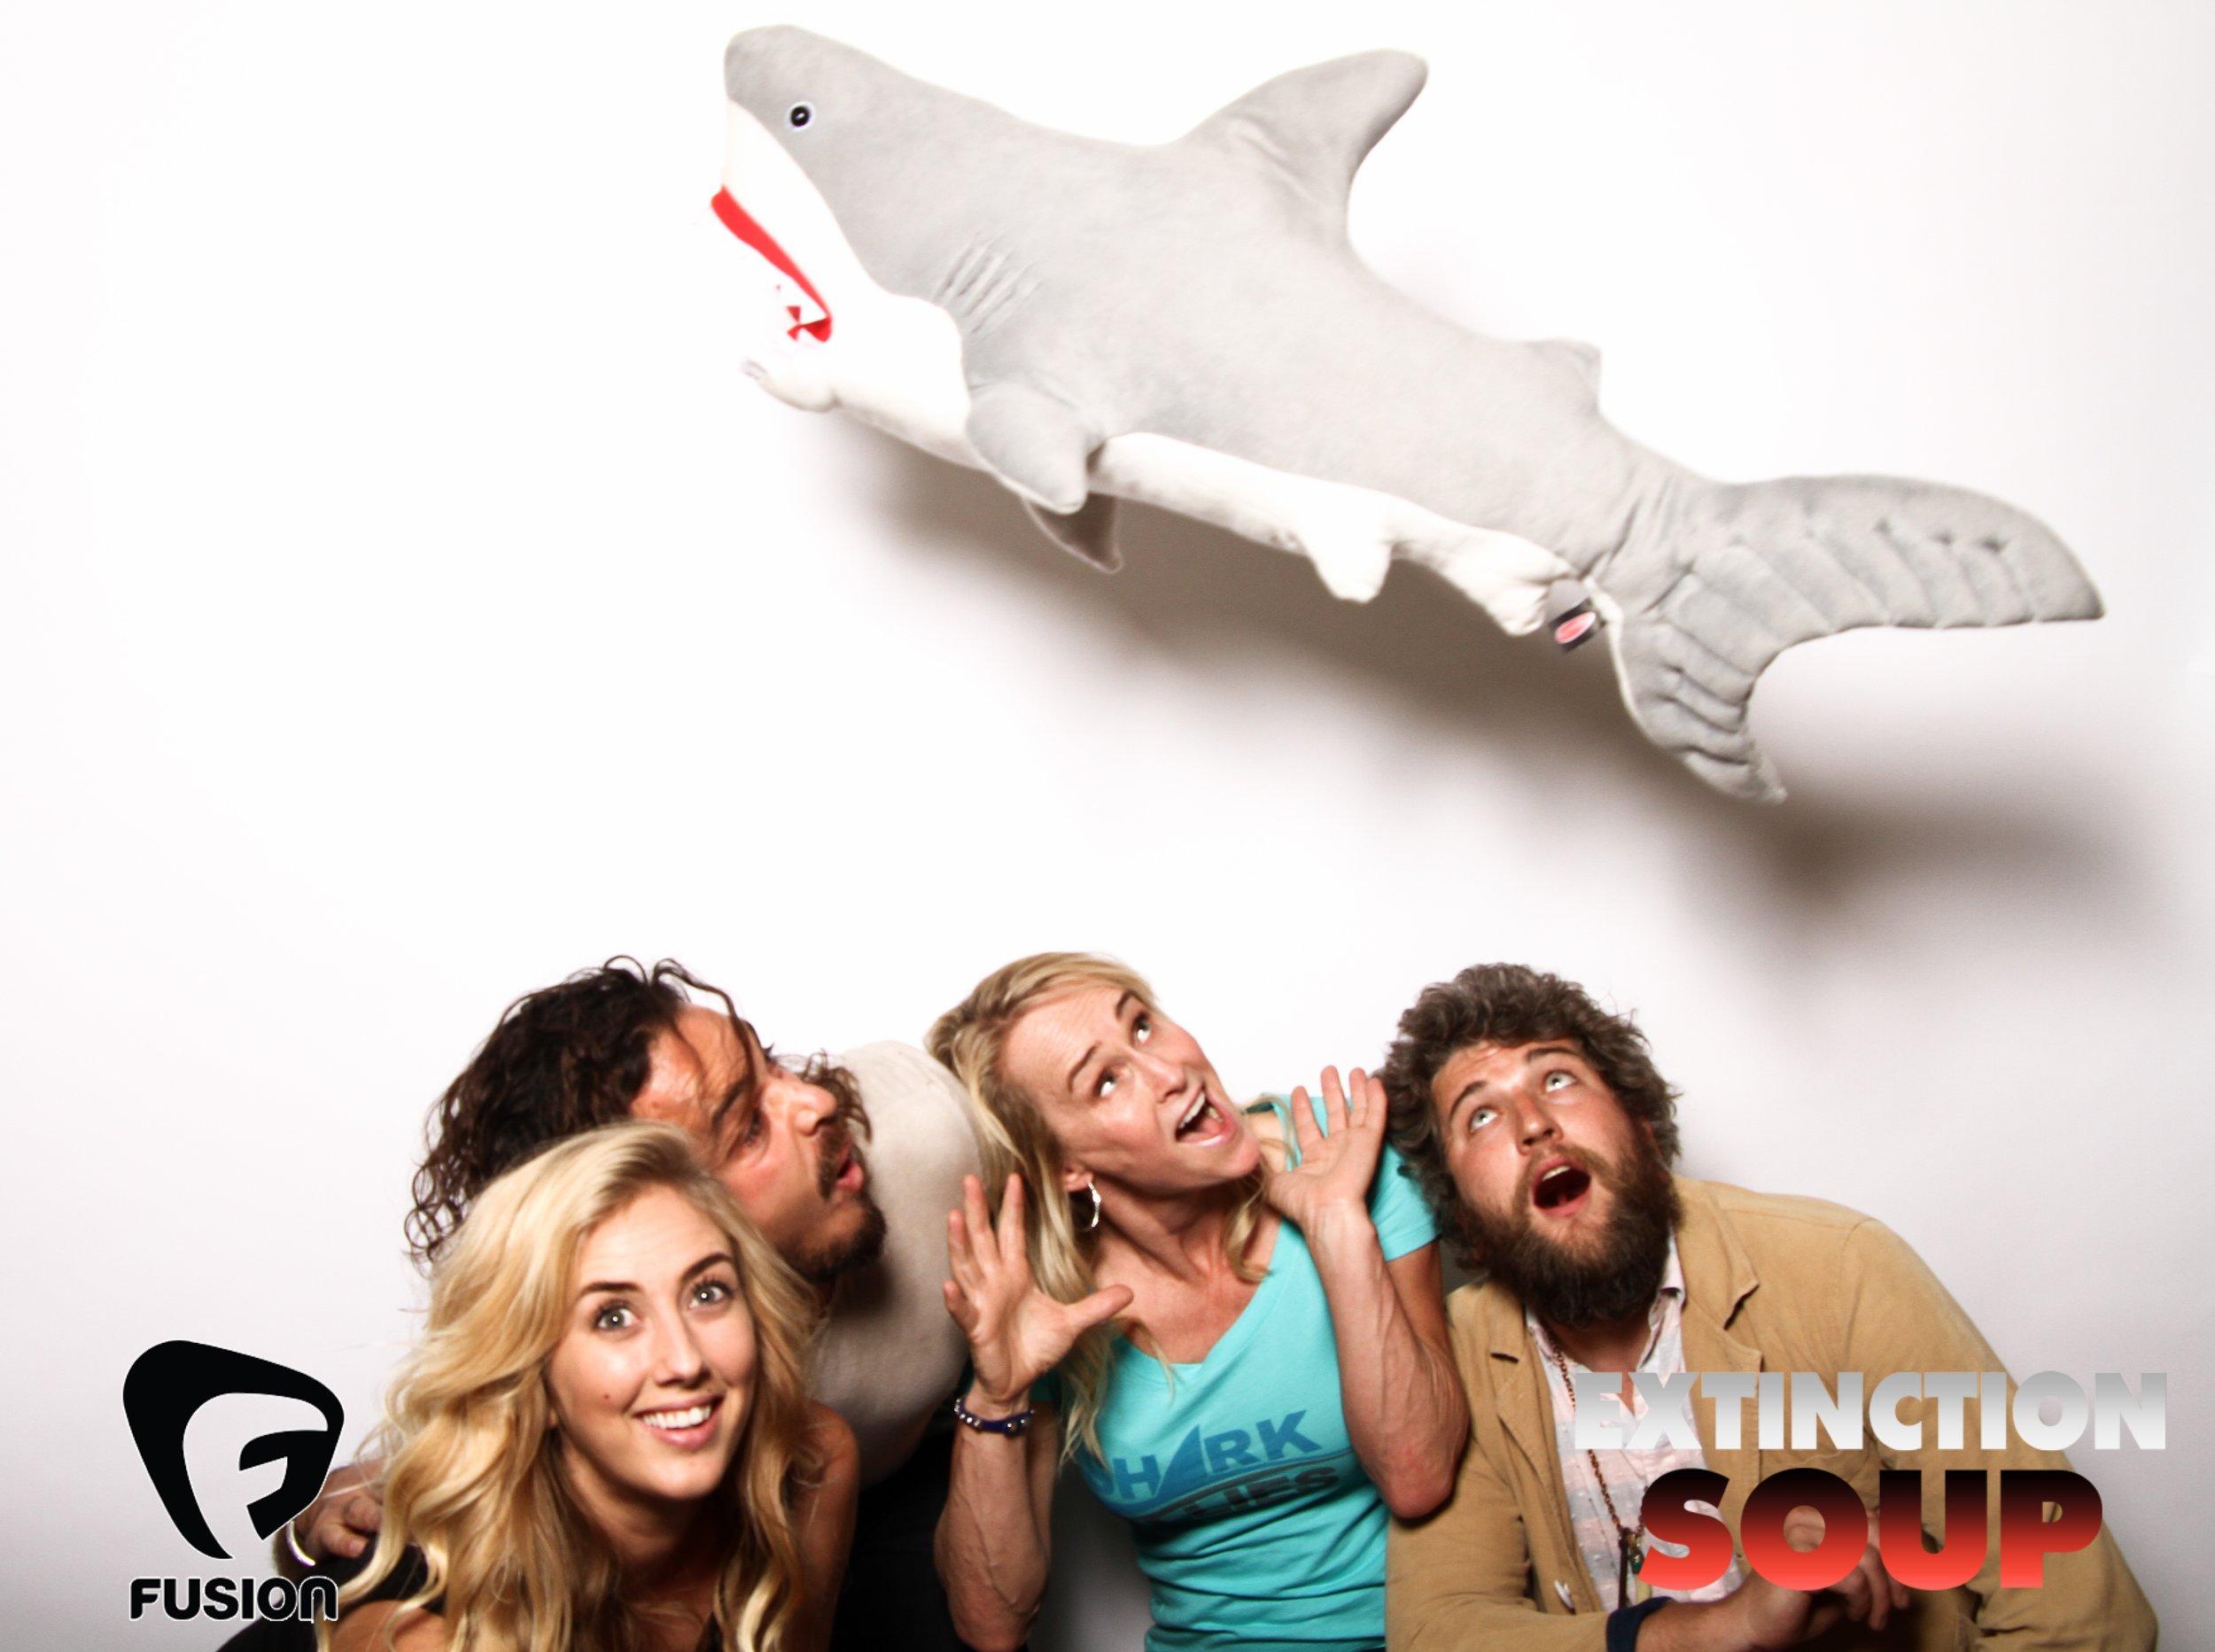 Photo booth fun with shark 1